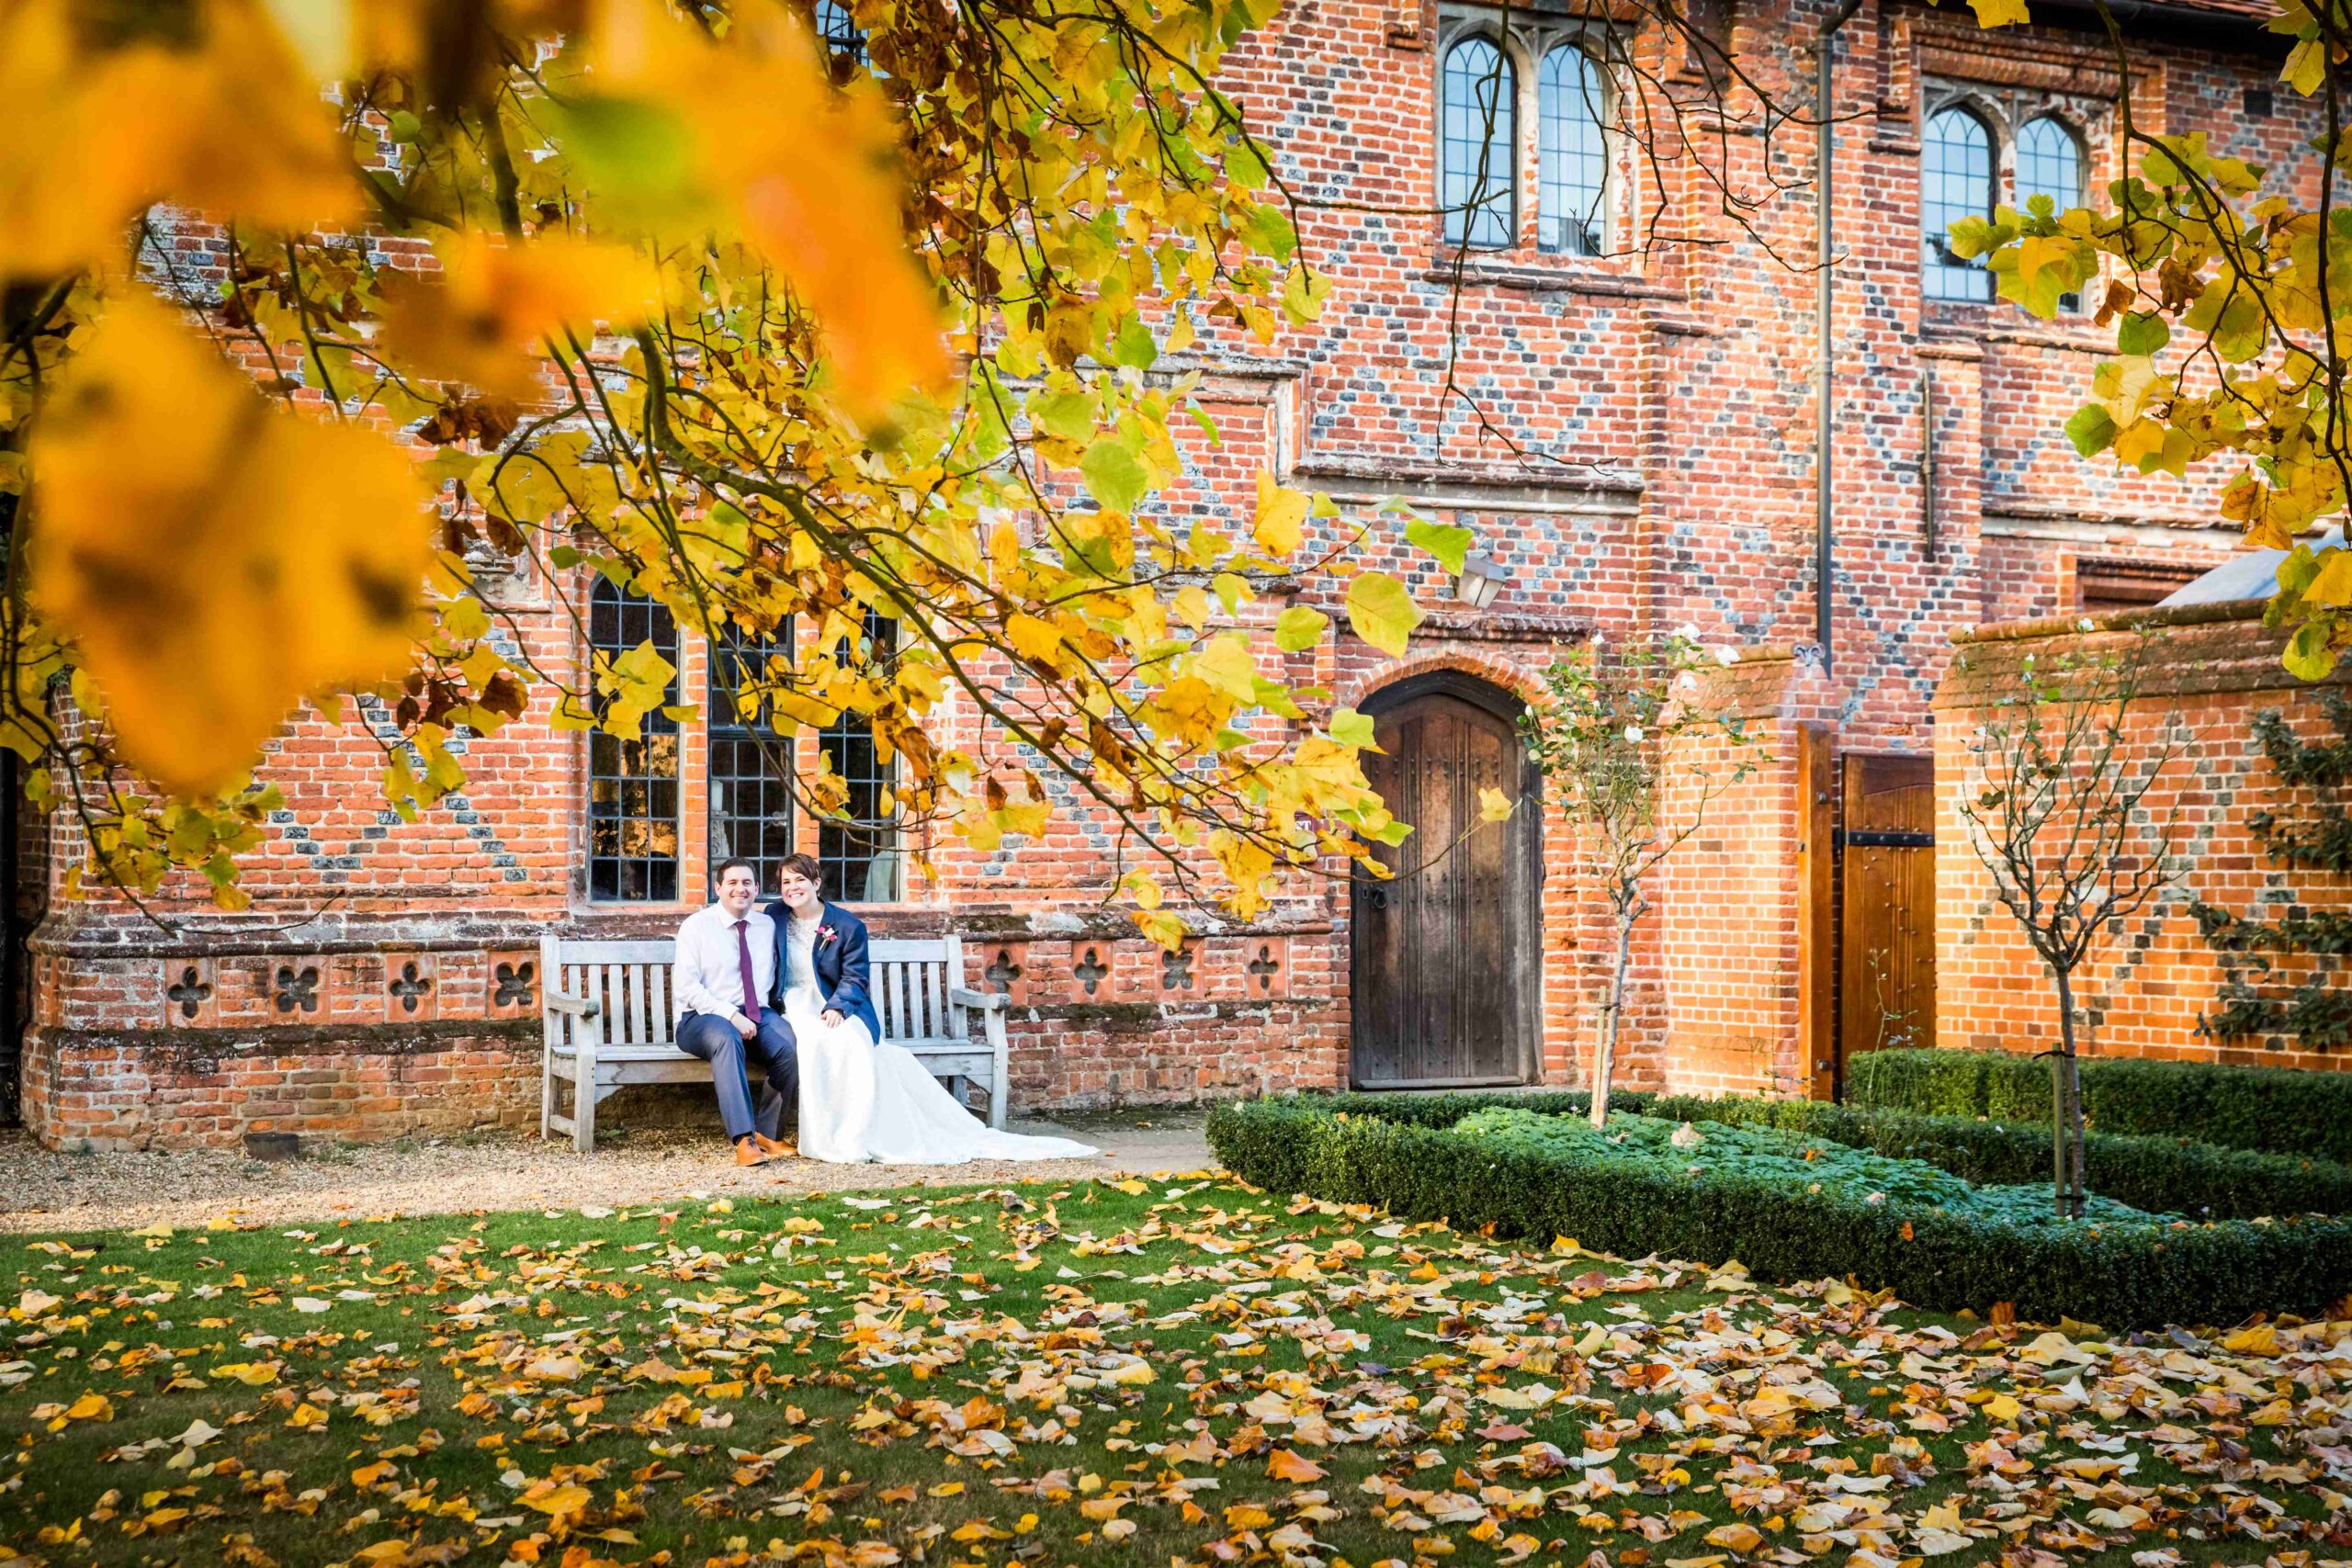 Wedding couple, Autumn leaves